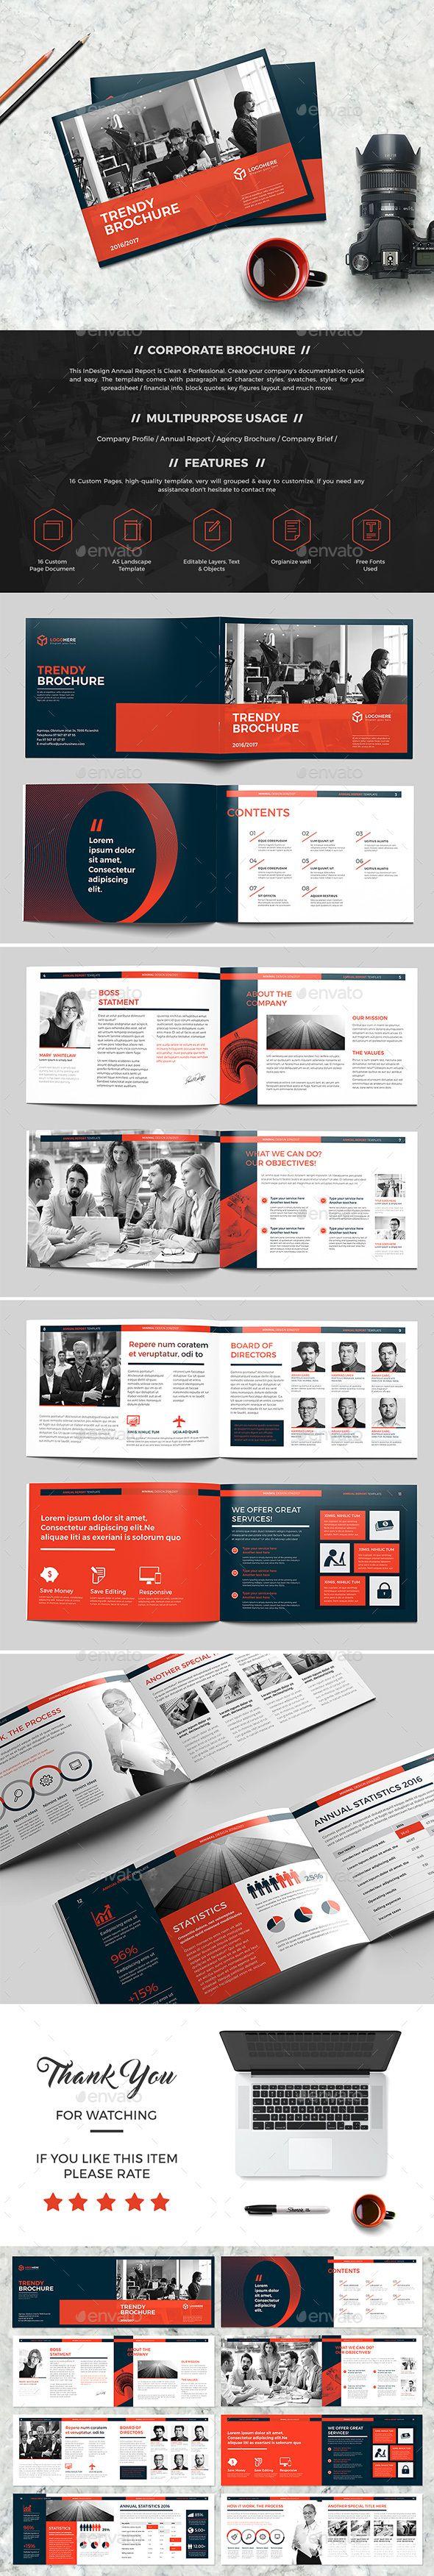 Landscape Brochure 16 Pages Template InDesign INDD. Download here ...